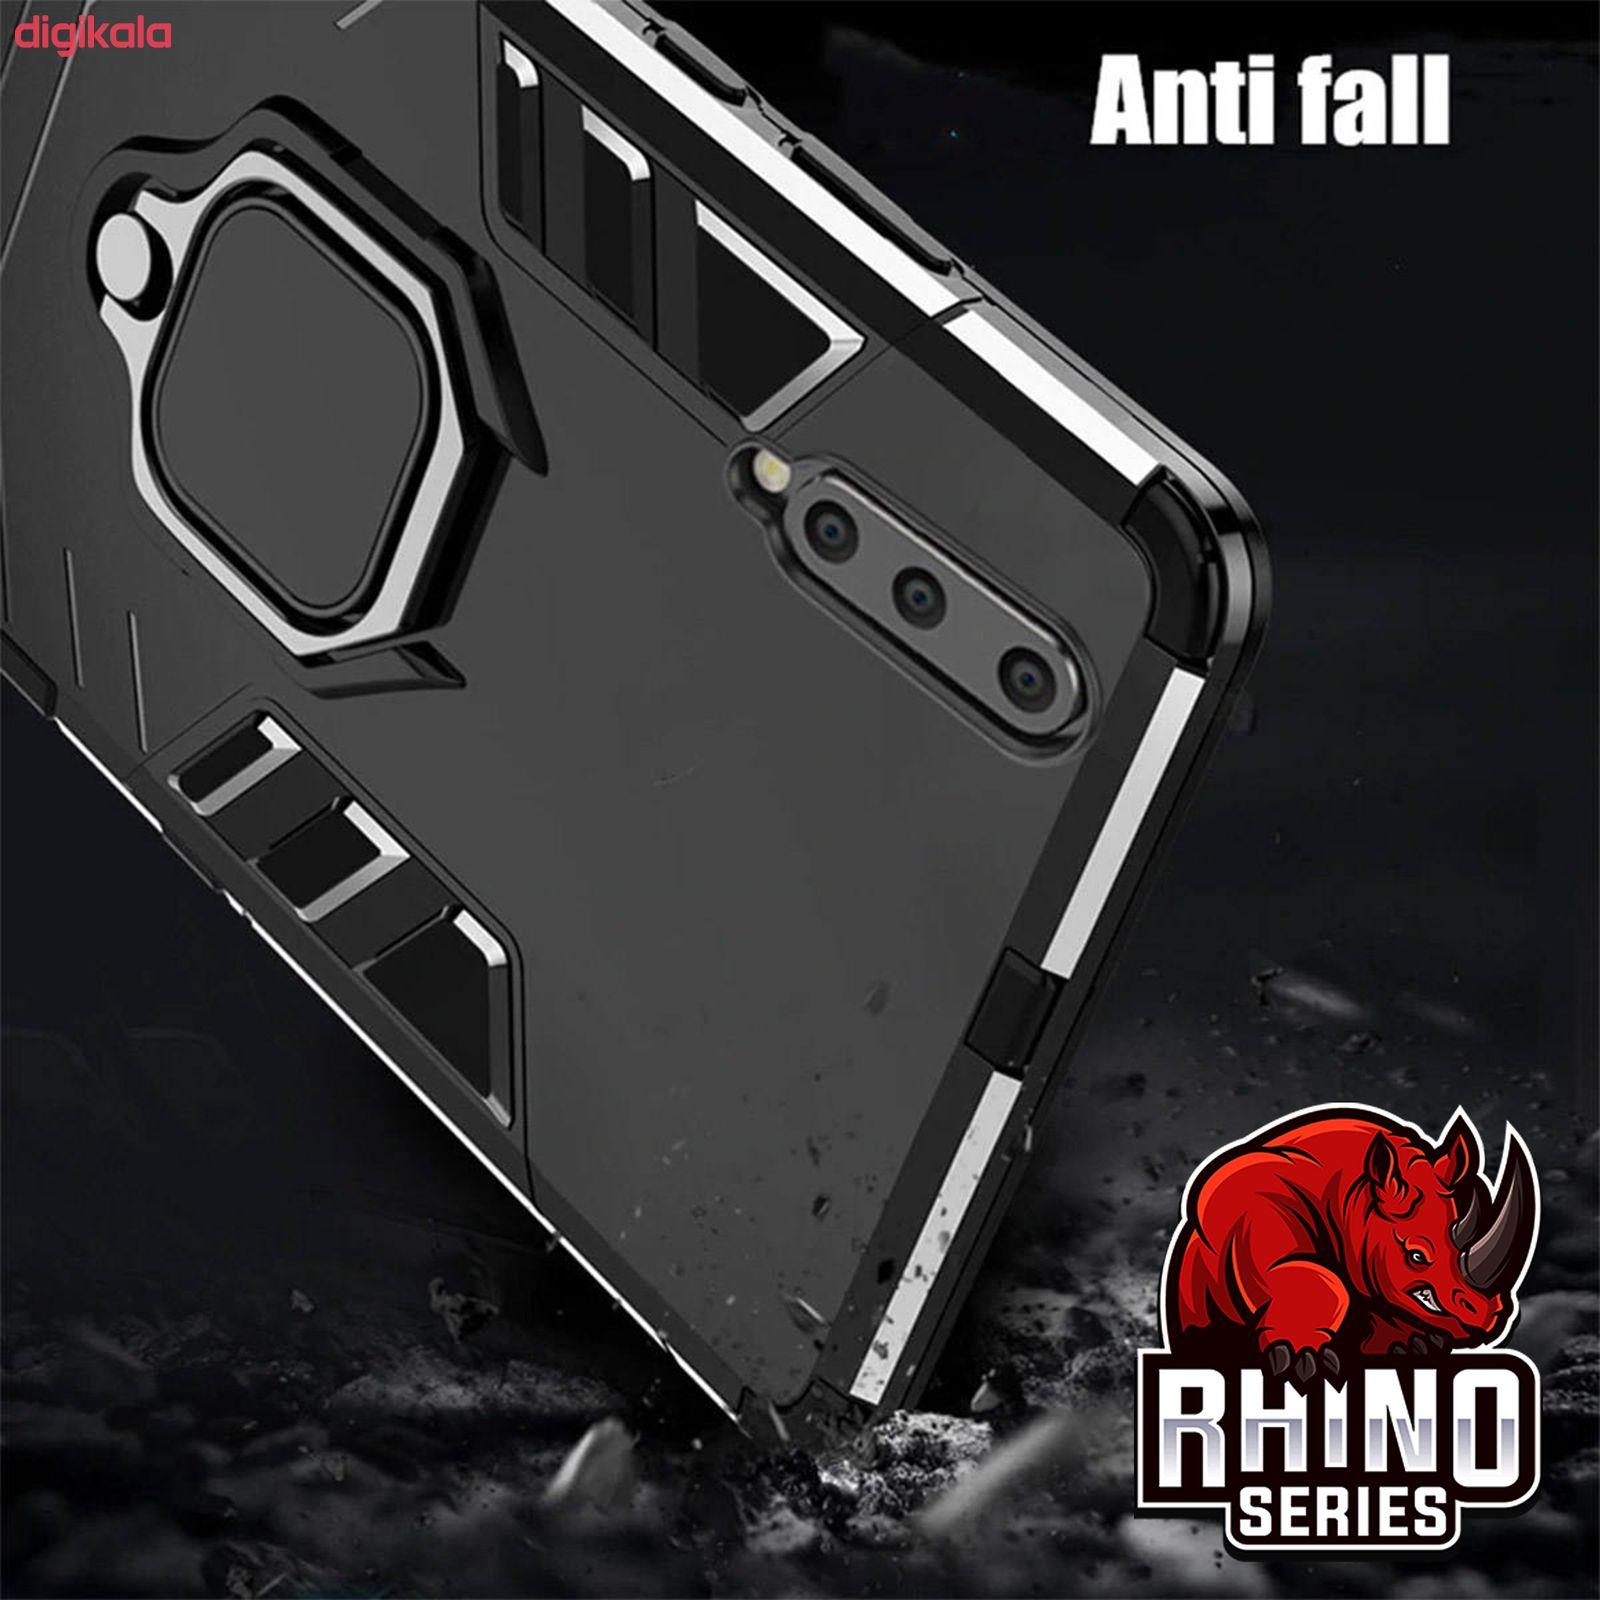 کاور کانواس مدل RHINO SERIES مناسب برای گوشی موبایل سامسونگ Galaxy A50s/A30s/A50 main 1 5